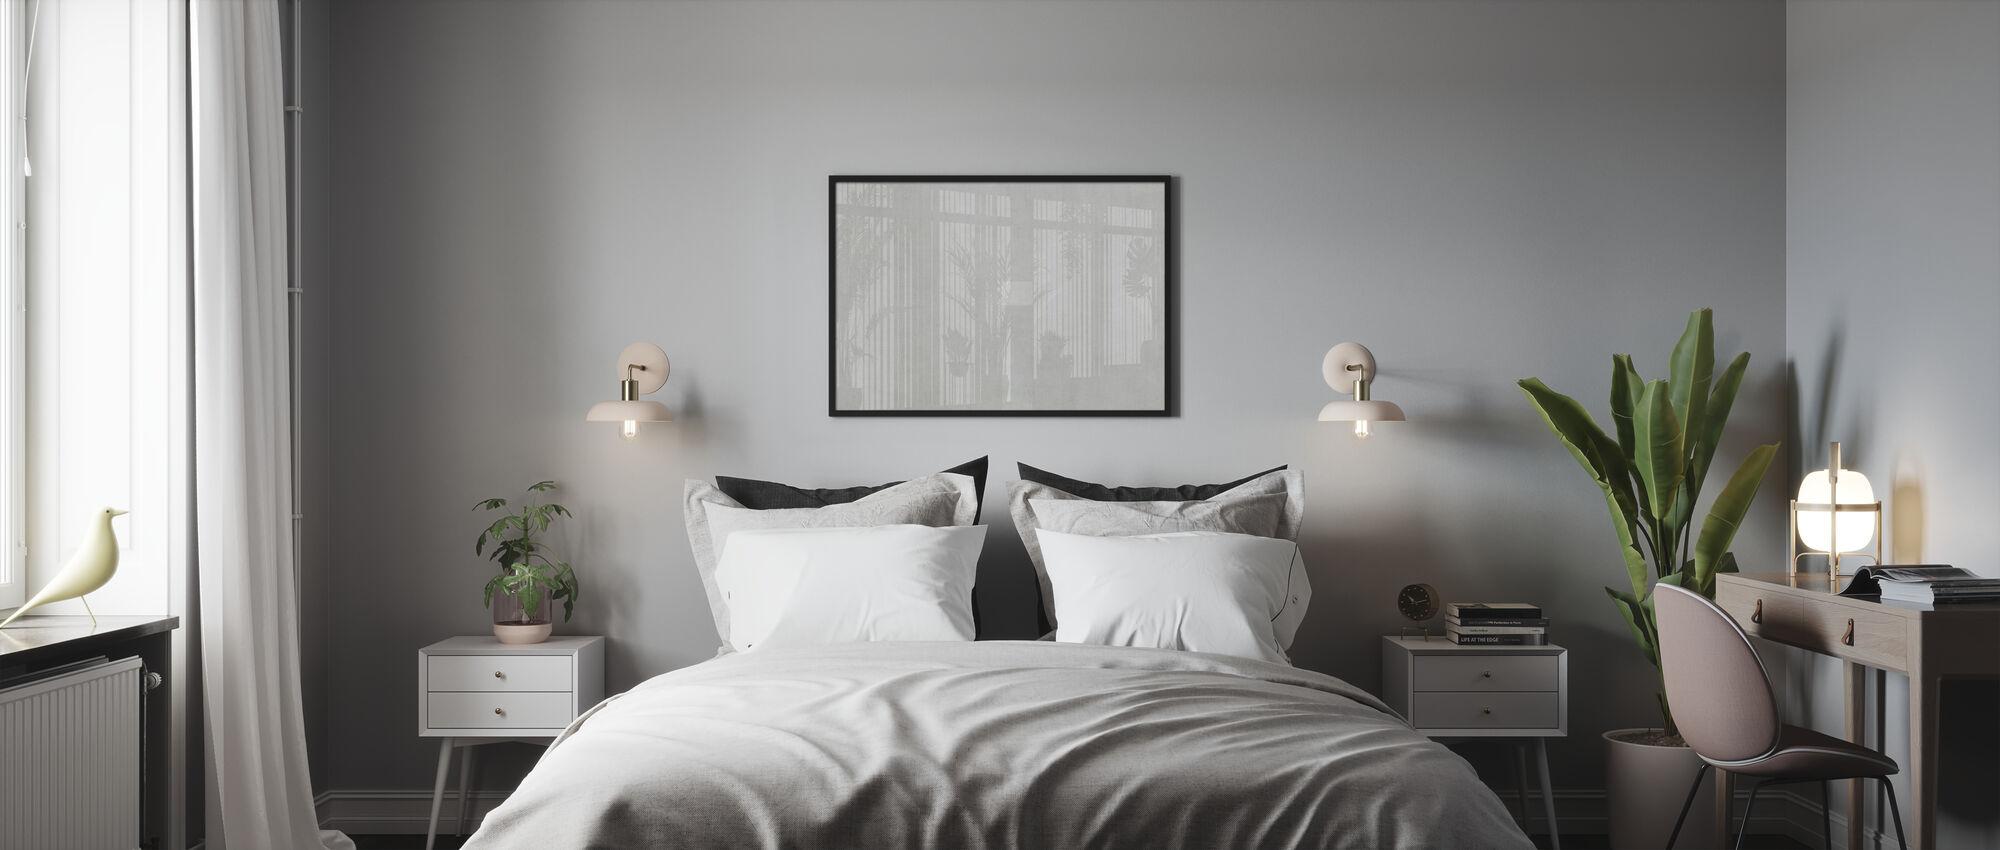 Sunny Window - Bright - Poster - Bedroom